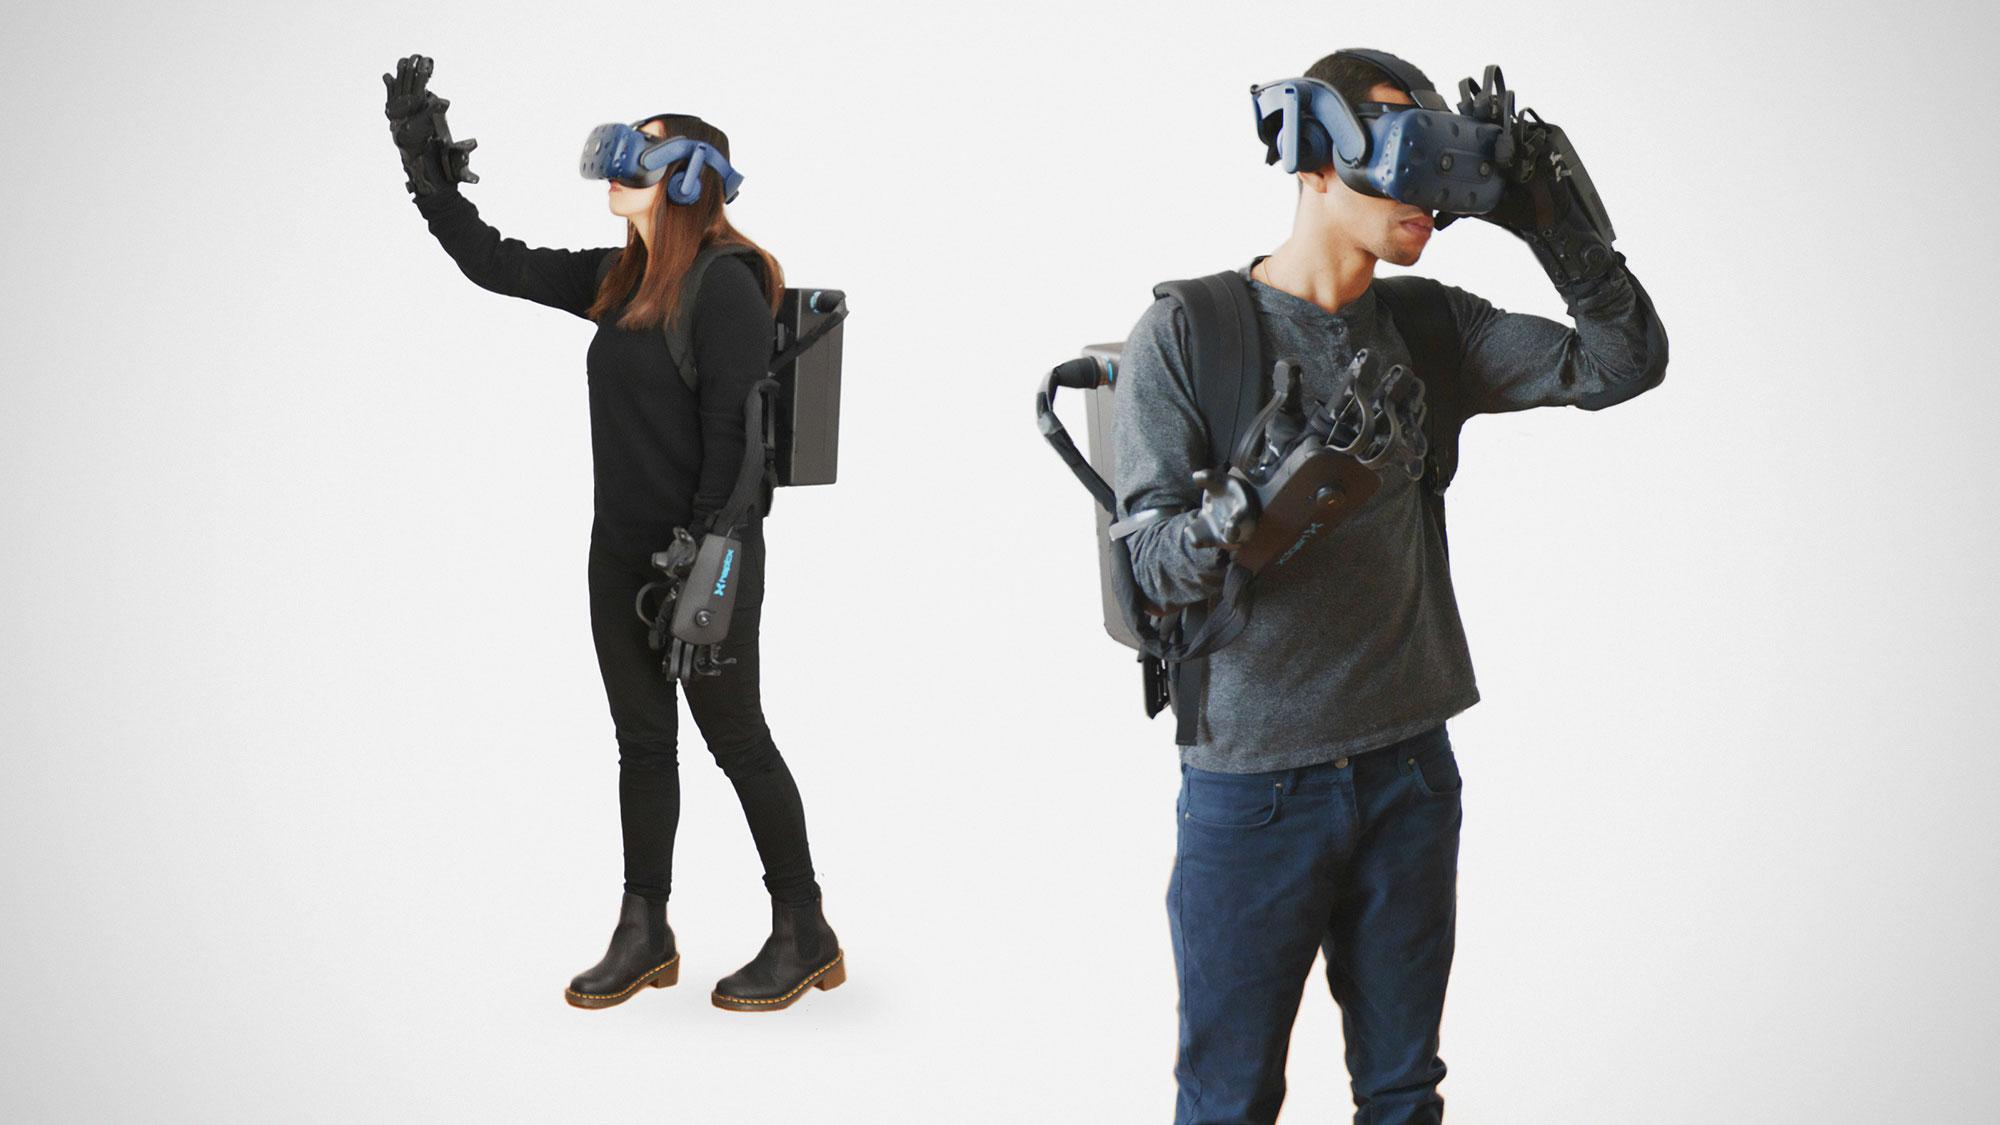 HaptX Gloves DK2 Haptic Feedback Gloves